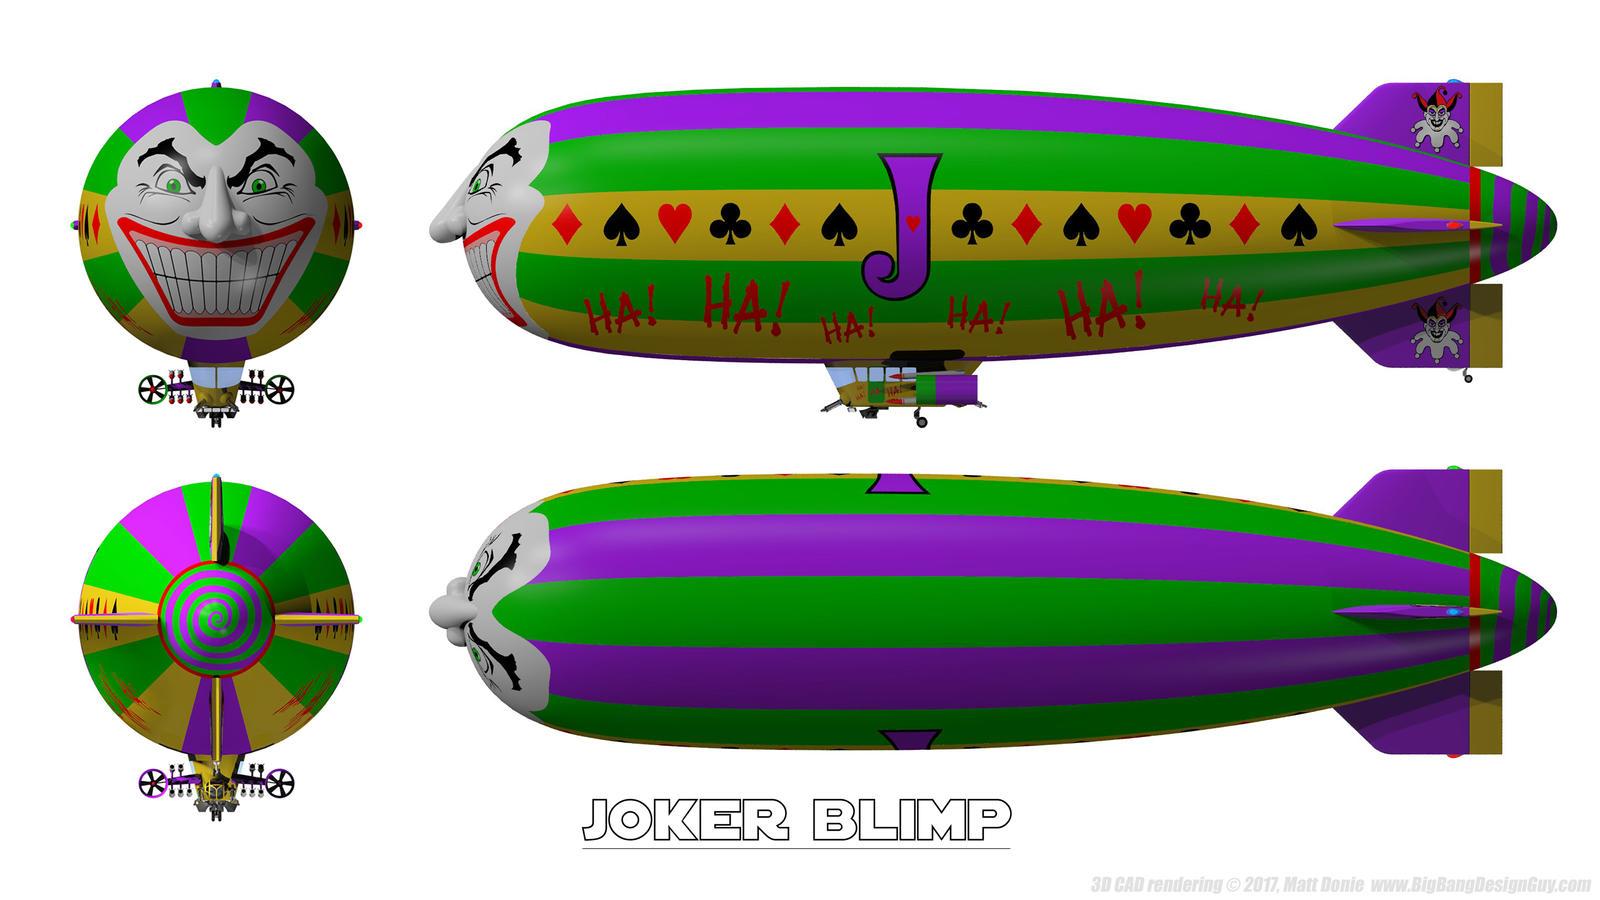 Batman - Arkham Skies - Joker Blimp Schematics 01 by ... on